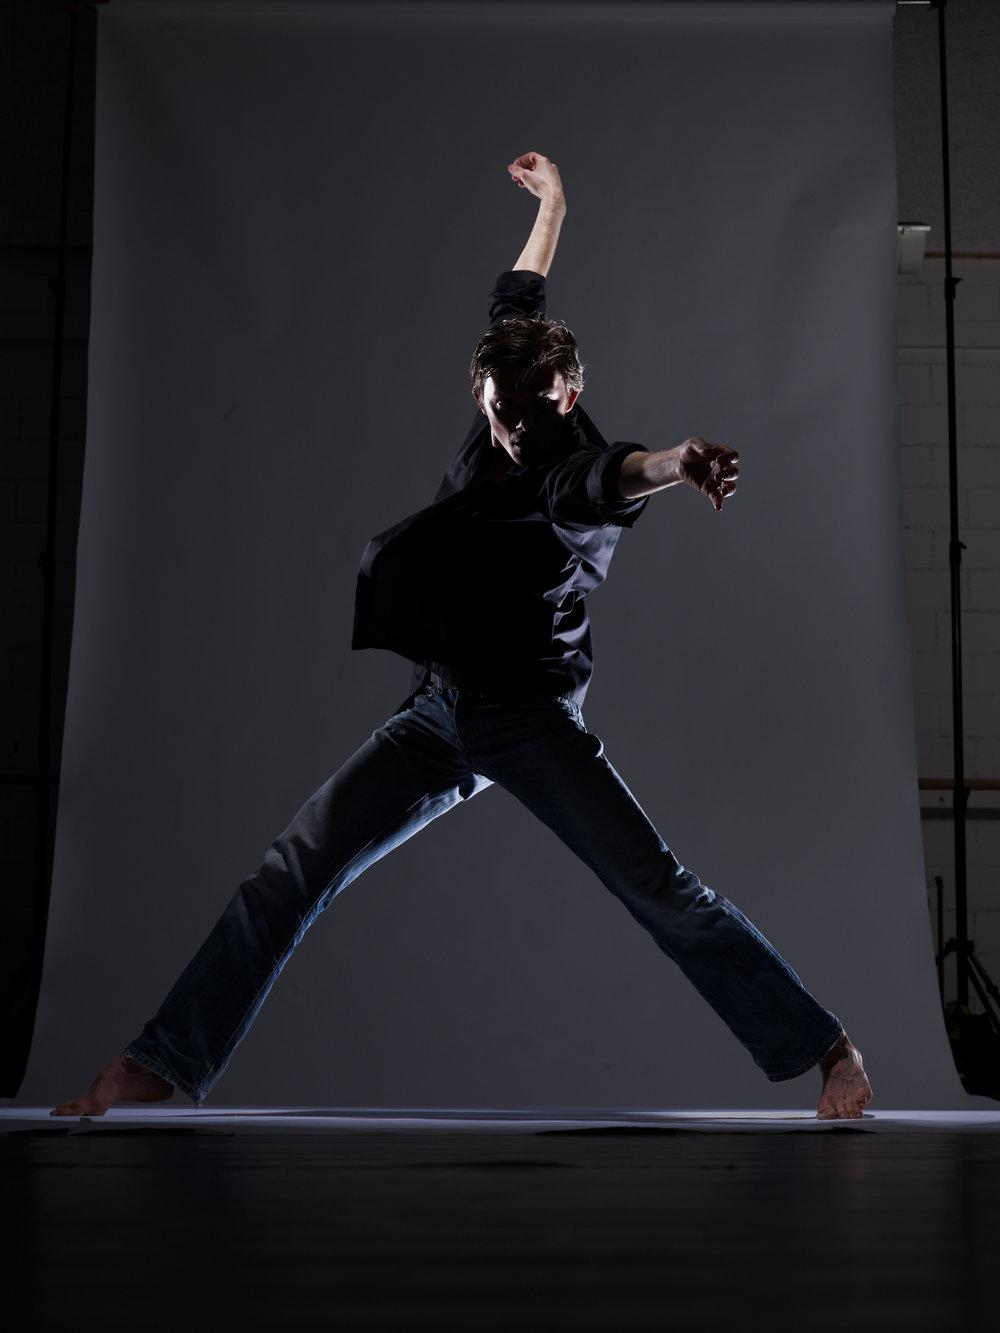 Bern_Ballet08_2-006090.jpg